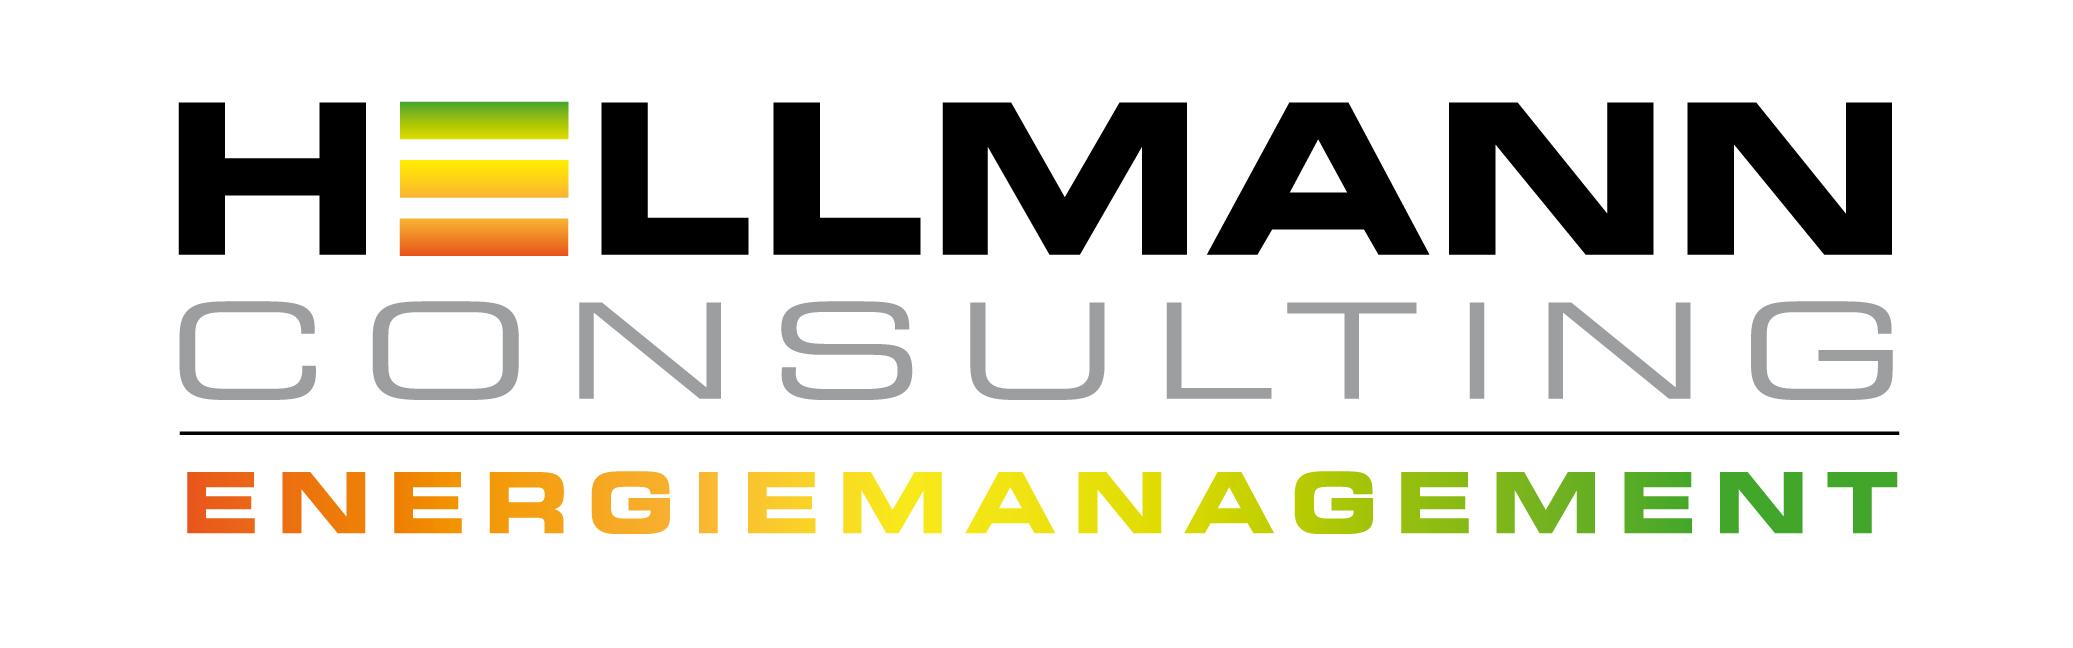 Hellmann Consulting Energiemanagement